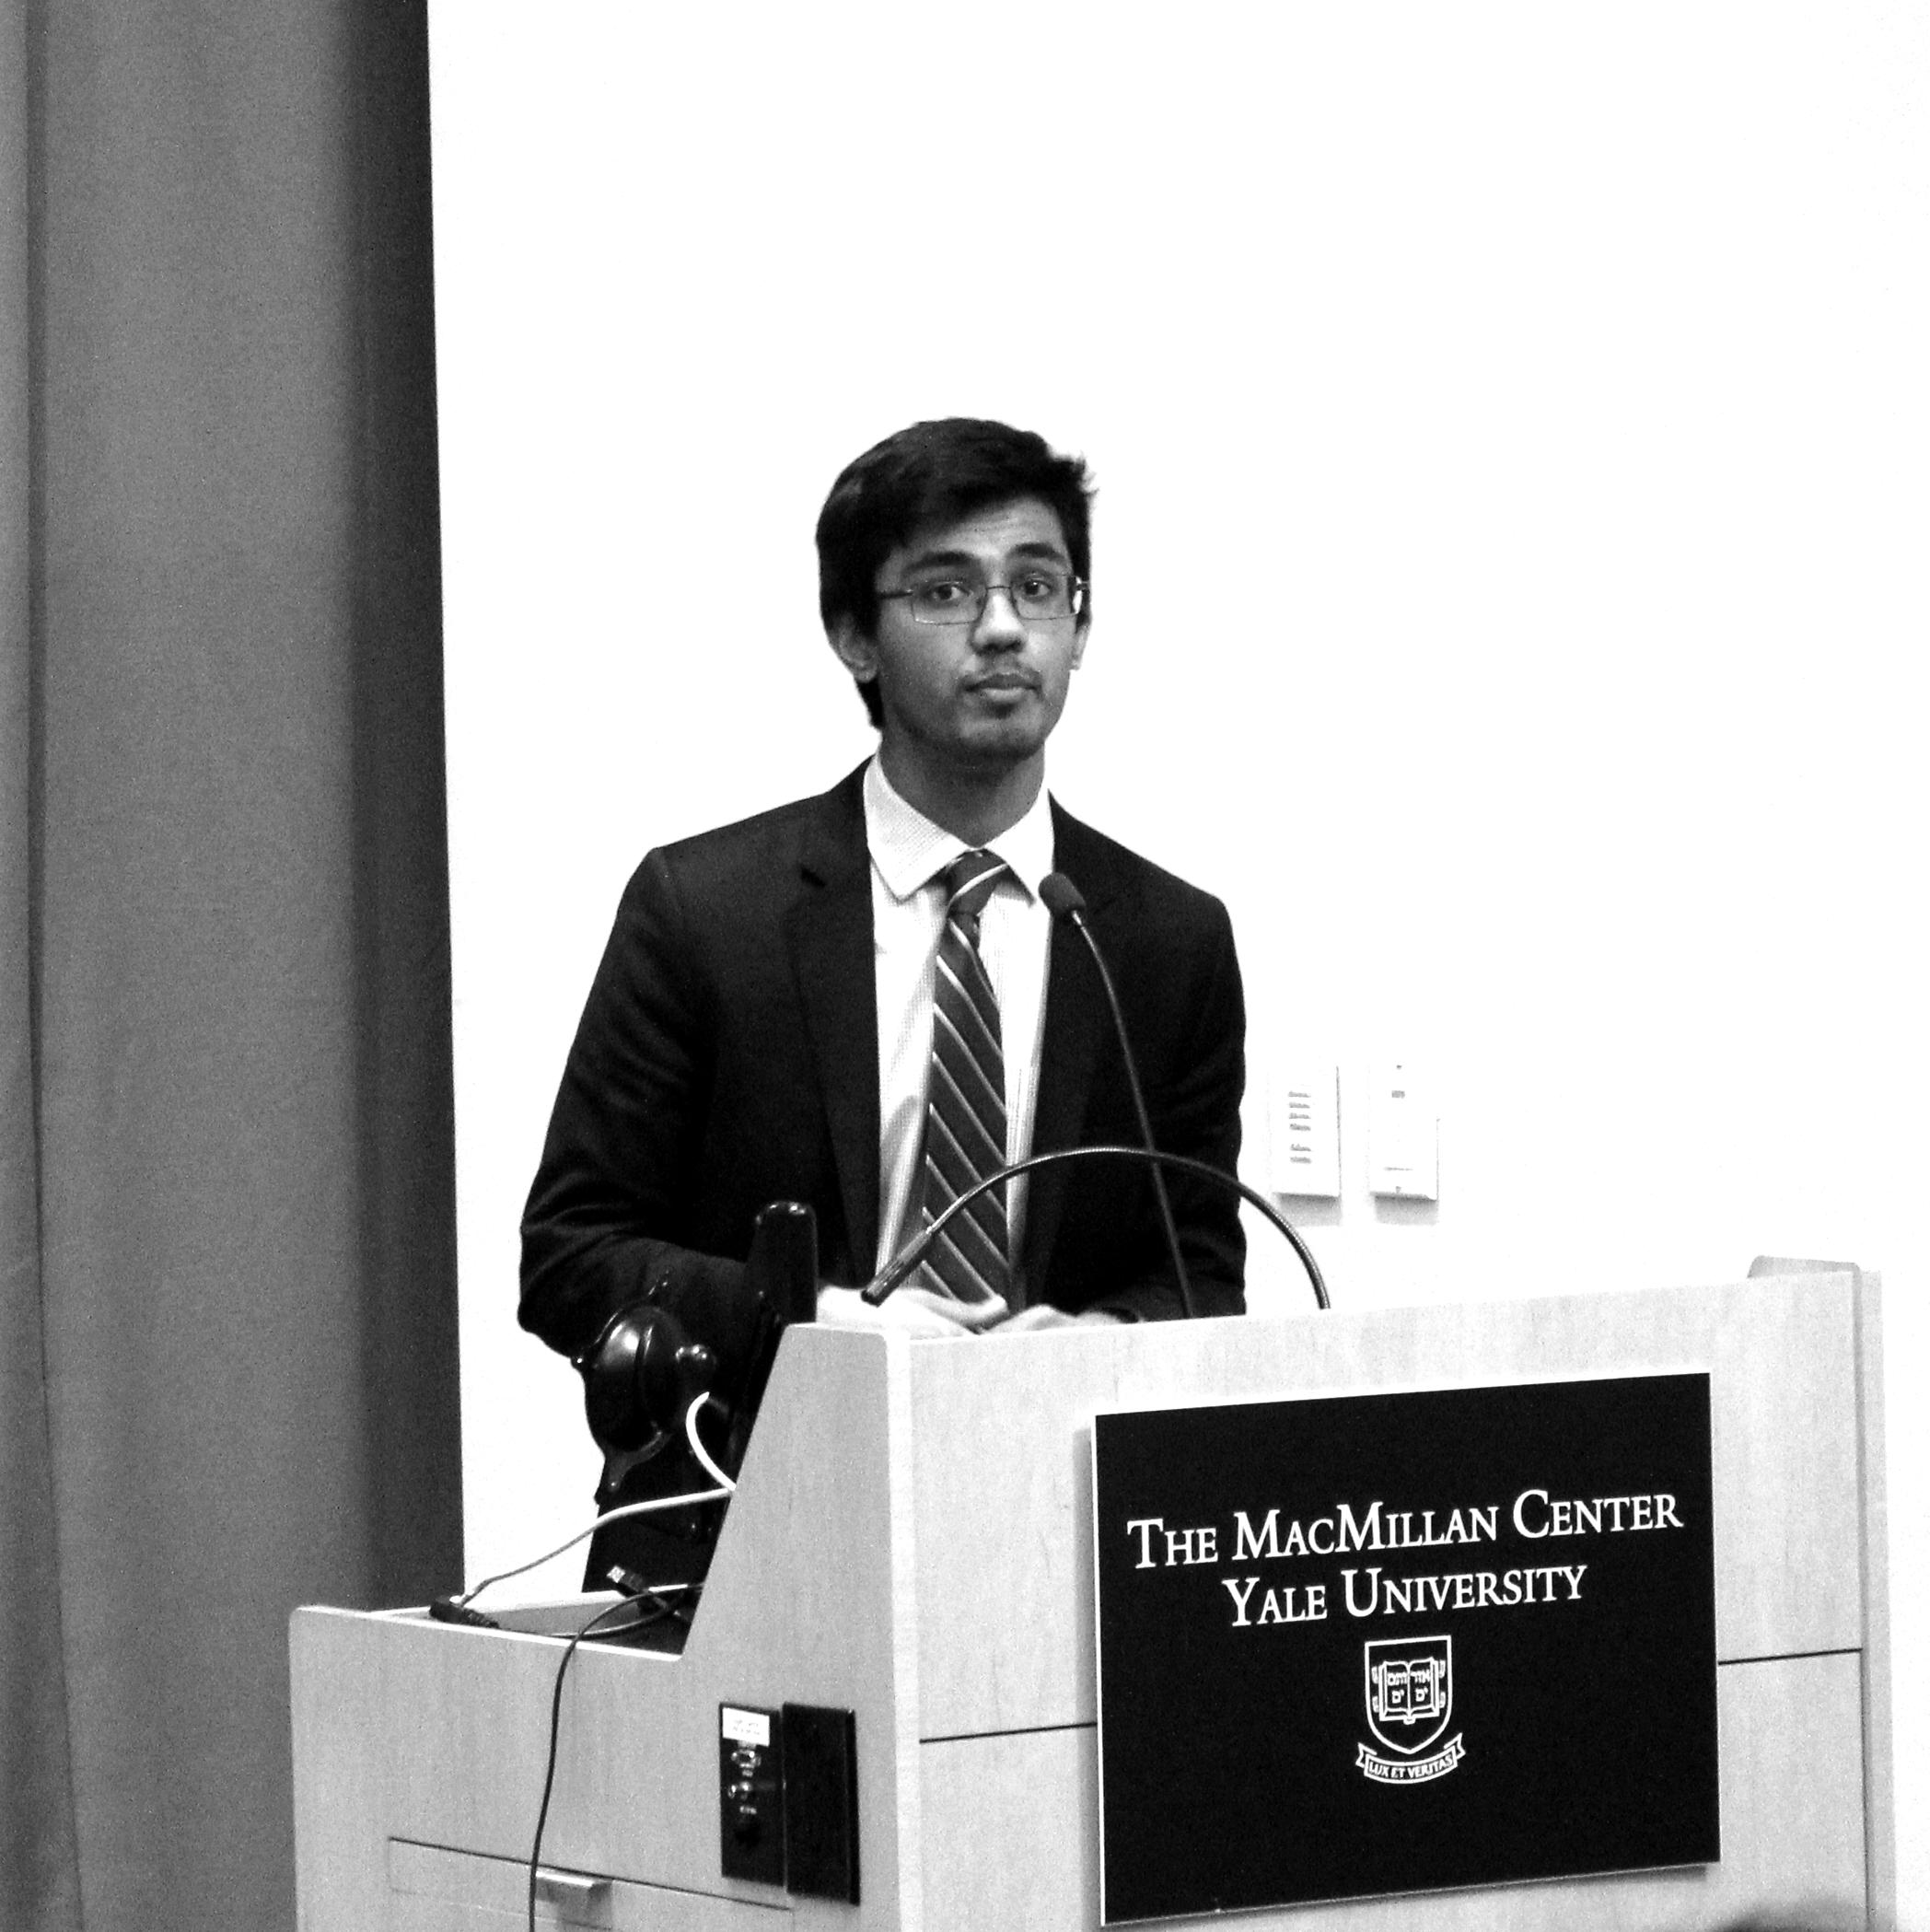 Neeraj Bajpayee, Princeton